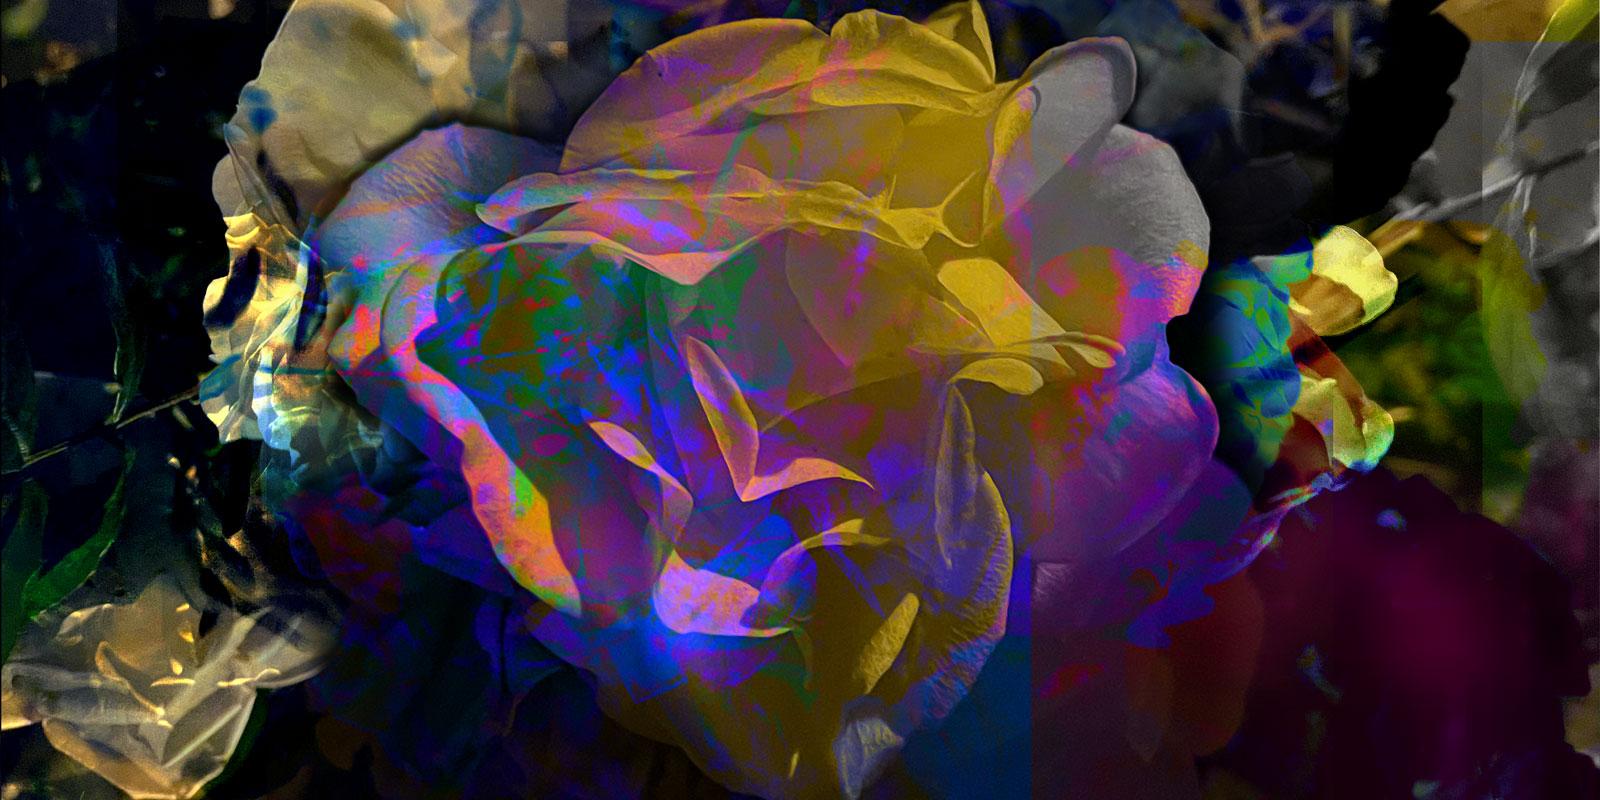 Flowers for AVS • 300 x 150 cm (118.11 x 59.06 in)